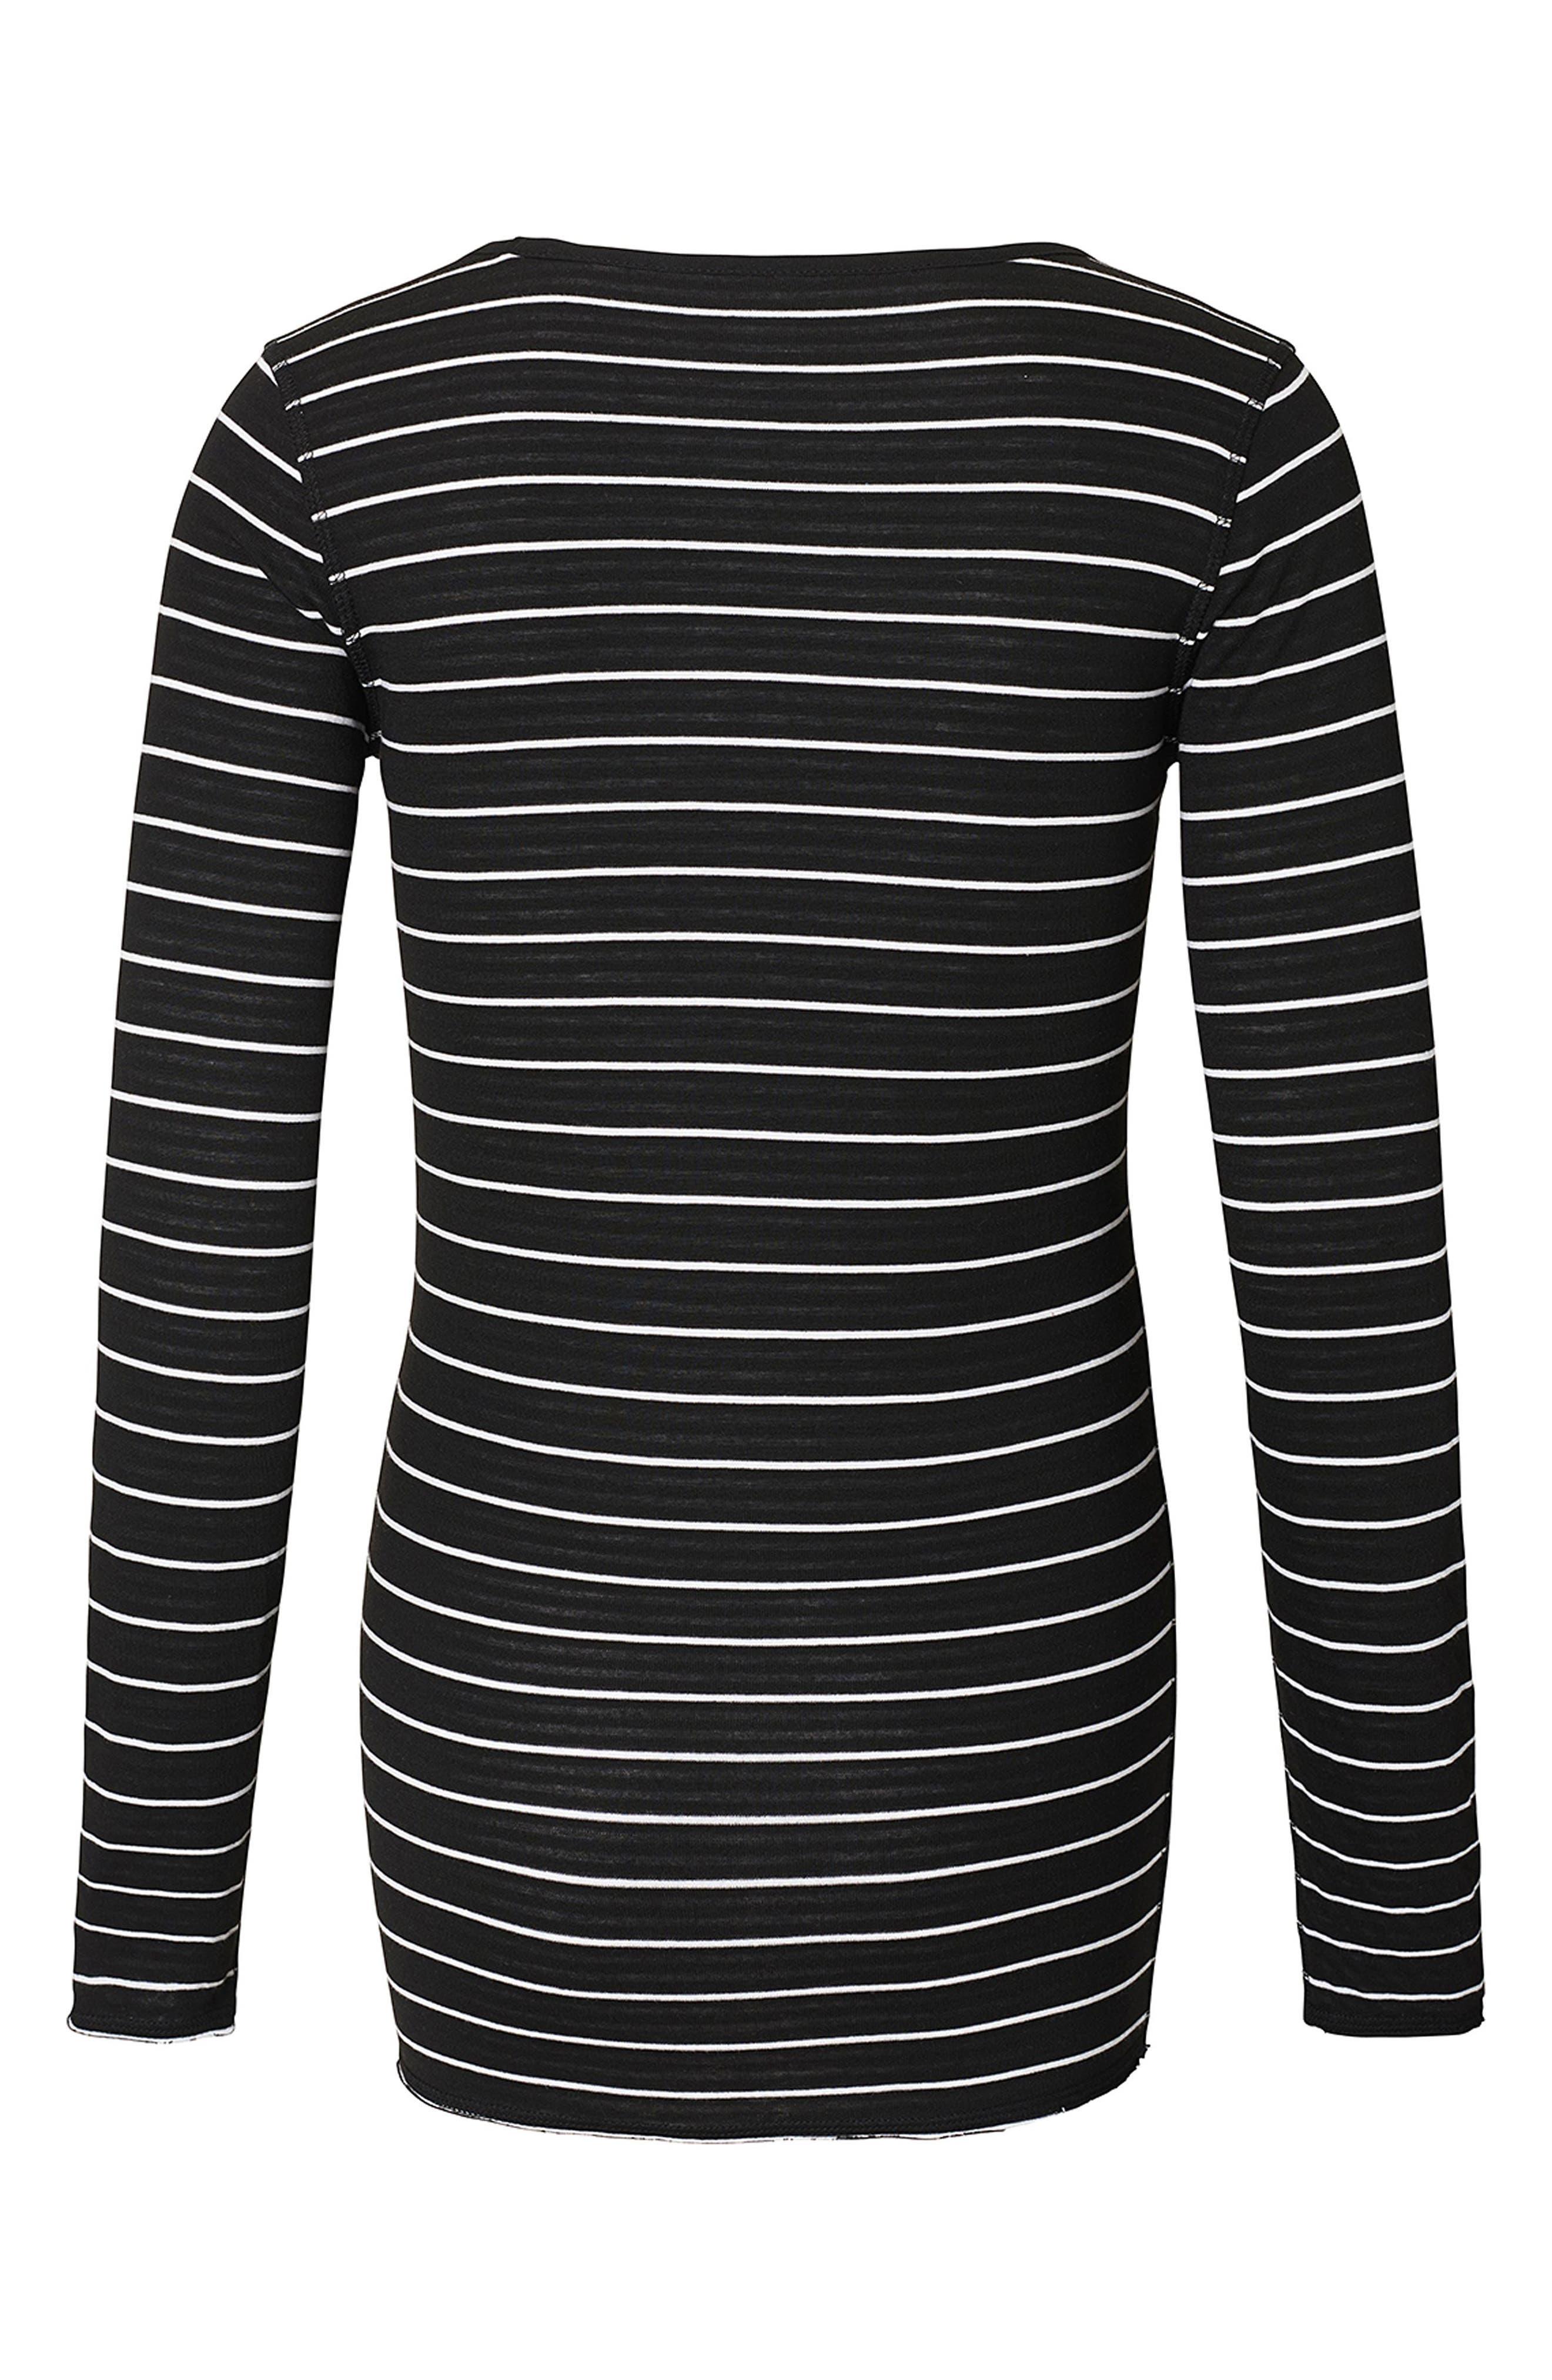 Ivy Stripe Maternity Shirt,                             Alternate thumbnail 3, color,                             Black